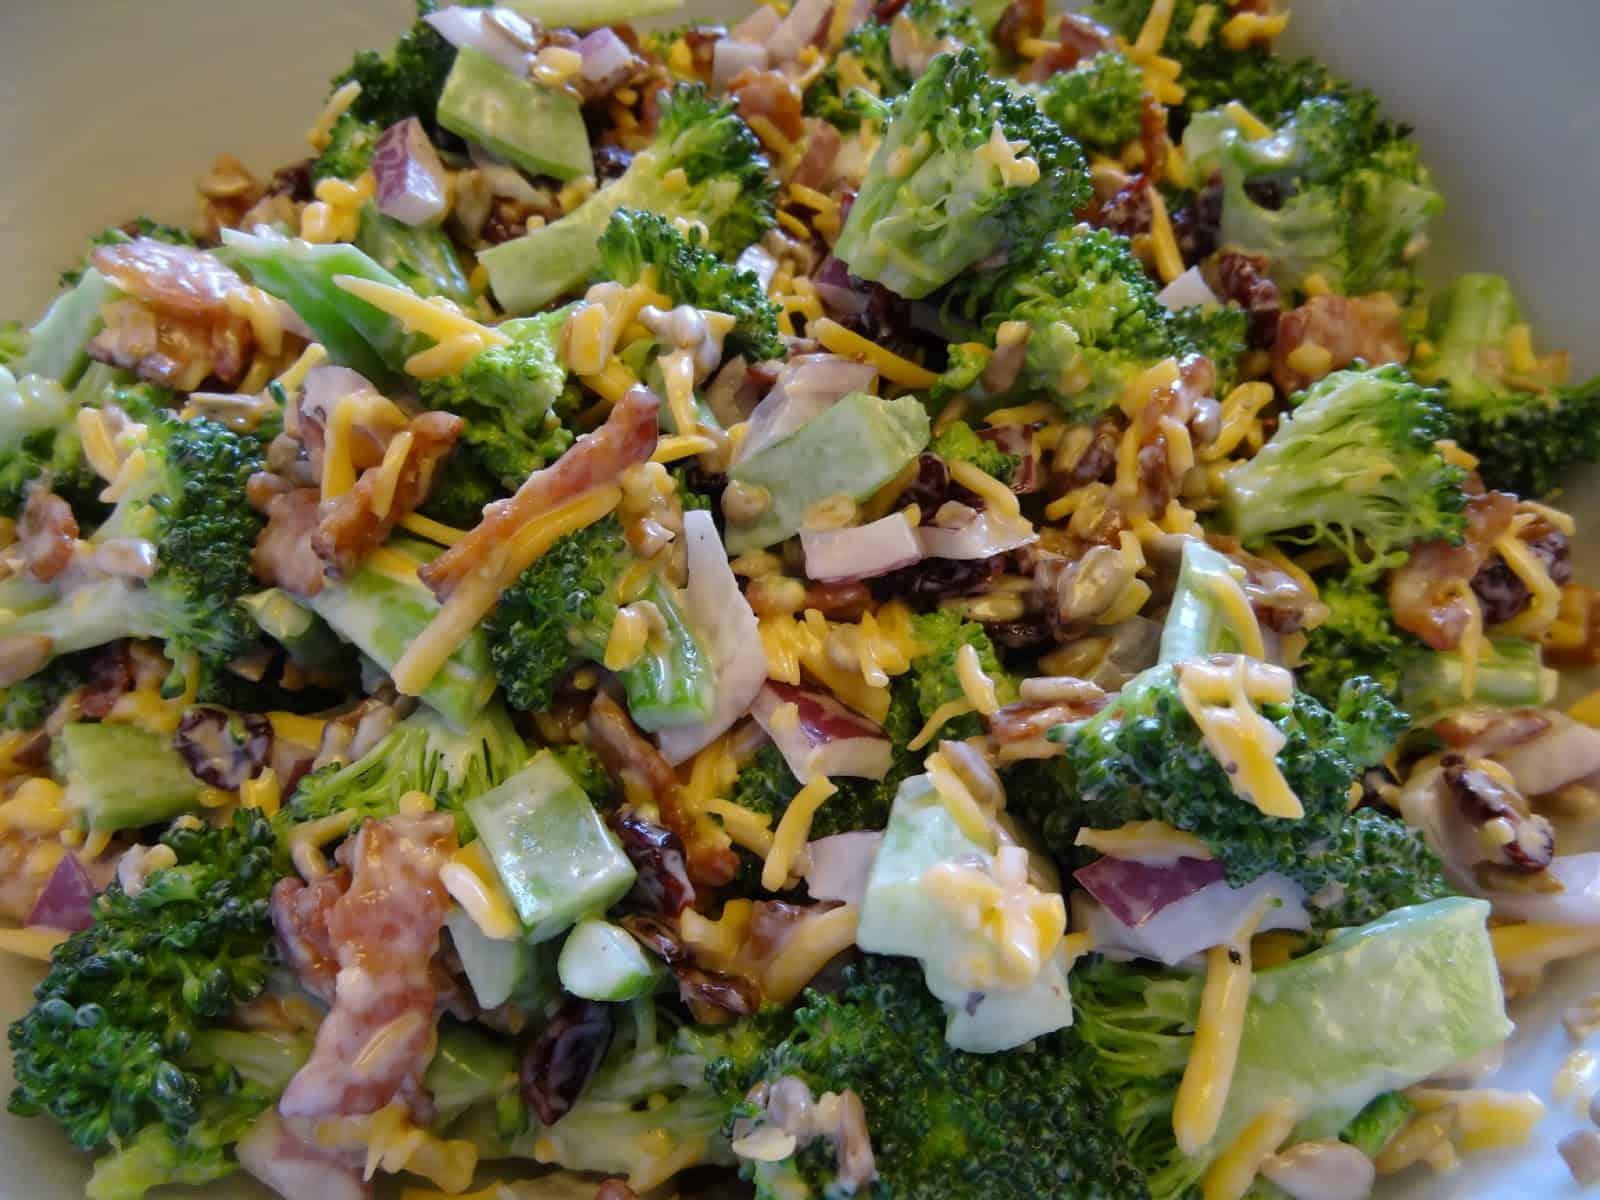 Cheese and bacon broccoli salad